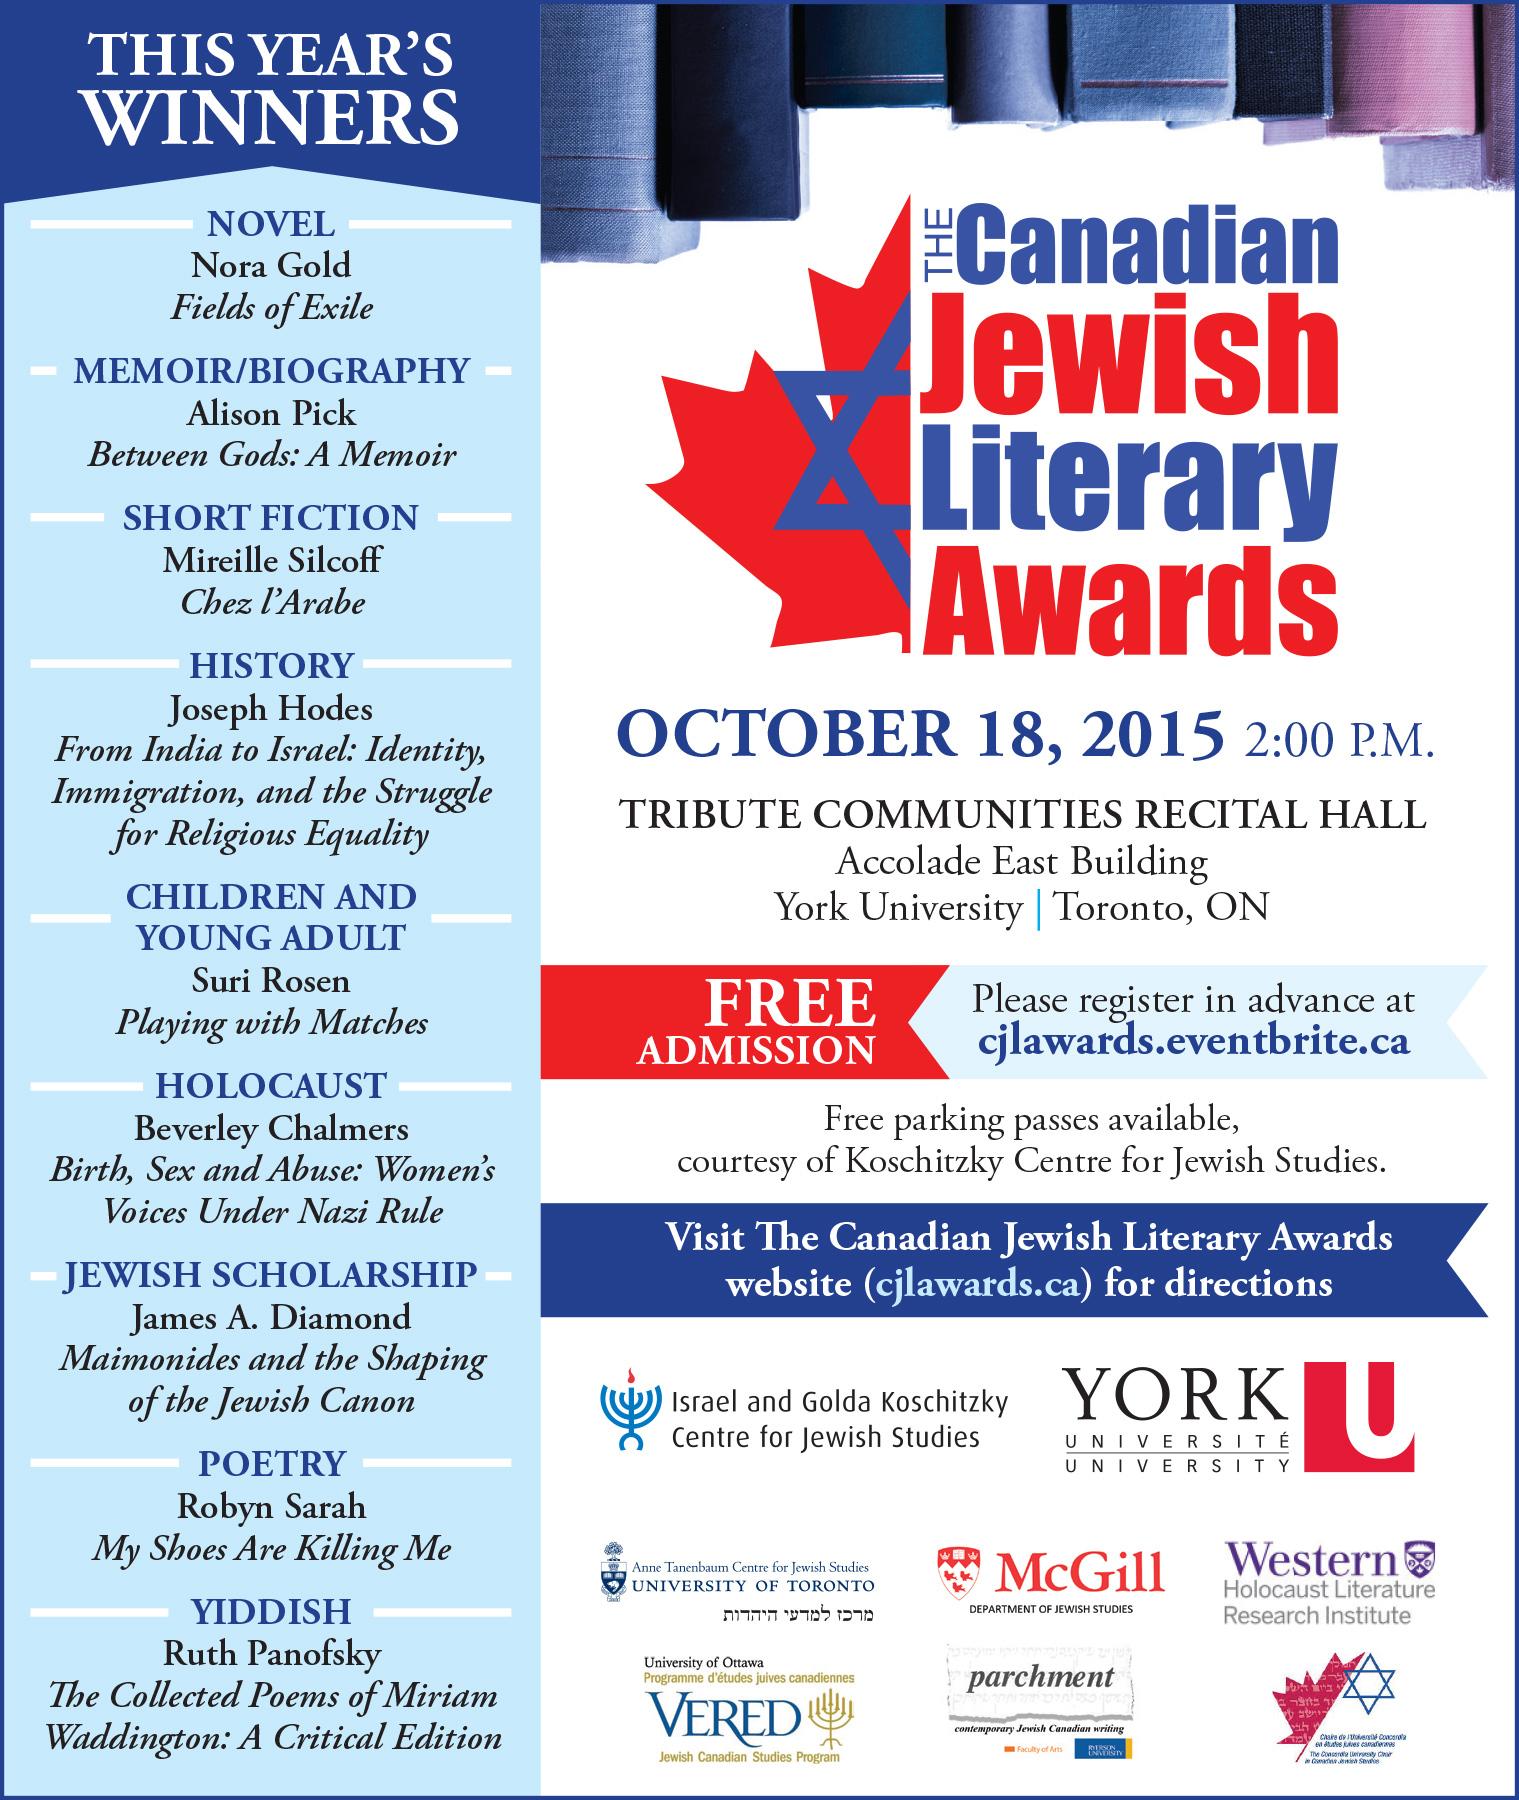 YorkCJS-CJN_LiteraryAwards-QtrPgAd-final